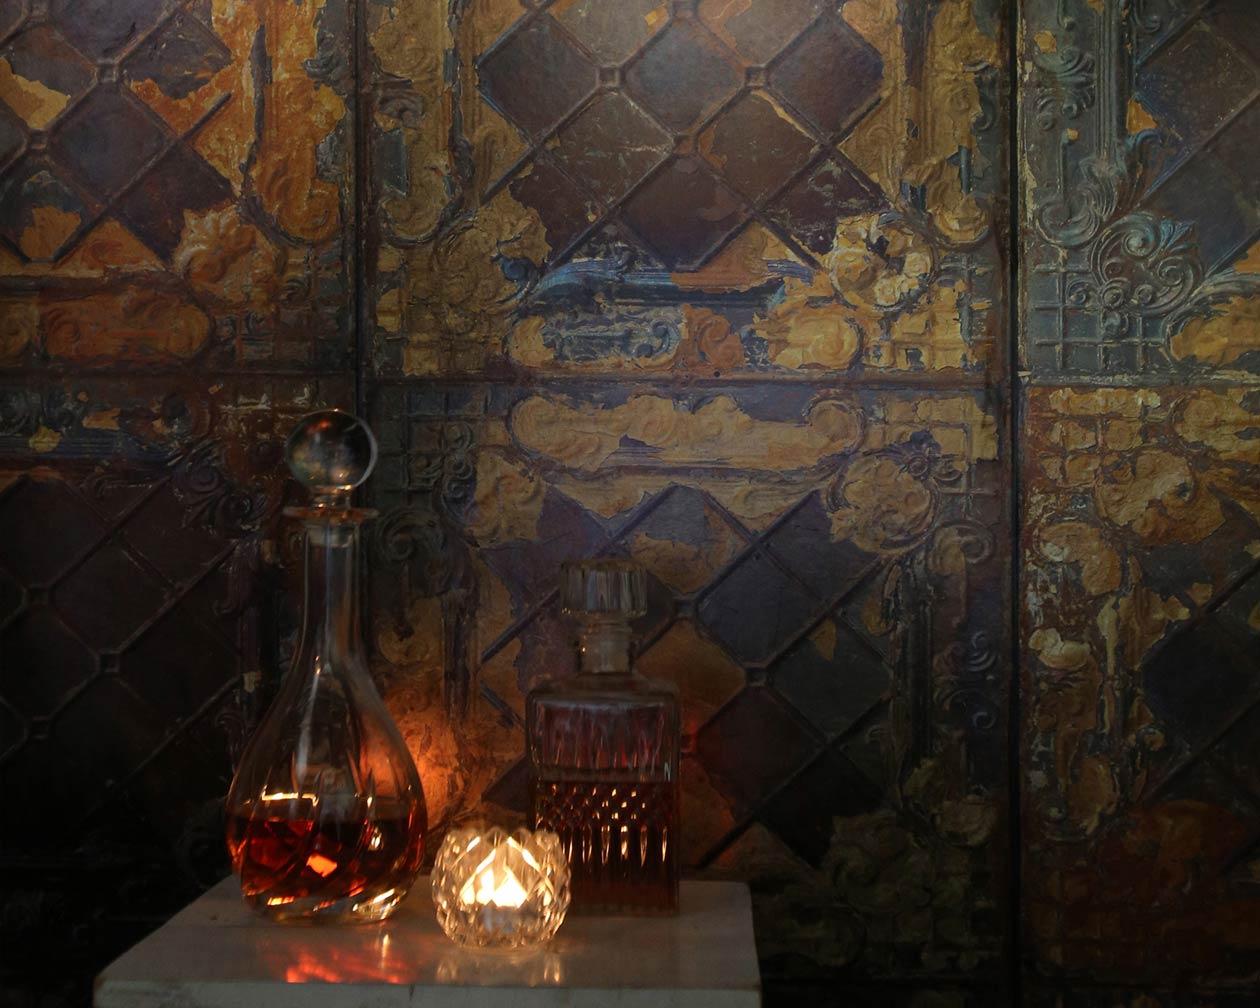 nlxl brooklyn tins tapete kaufen by nlxl livingwalls. Black Bedroom Furniture Sets. Home Design Ideas